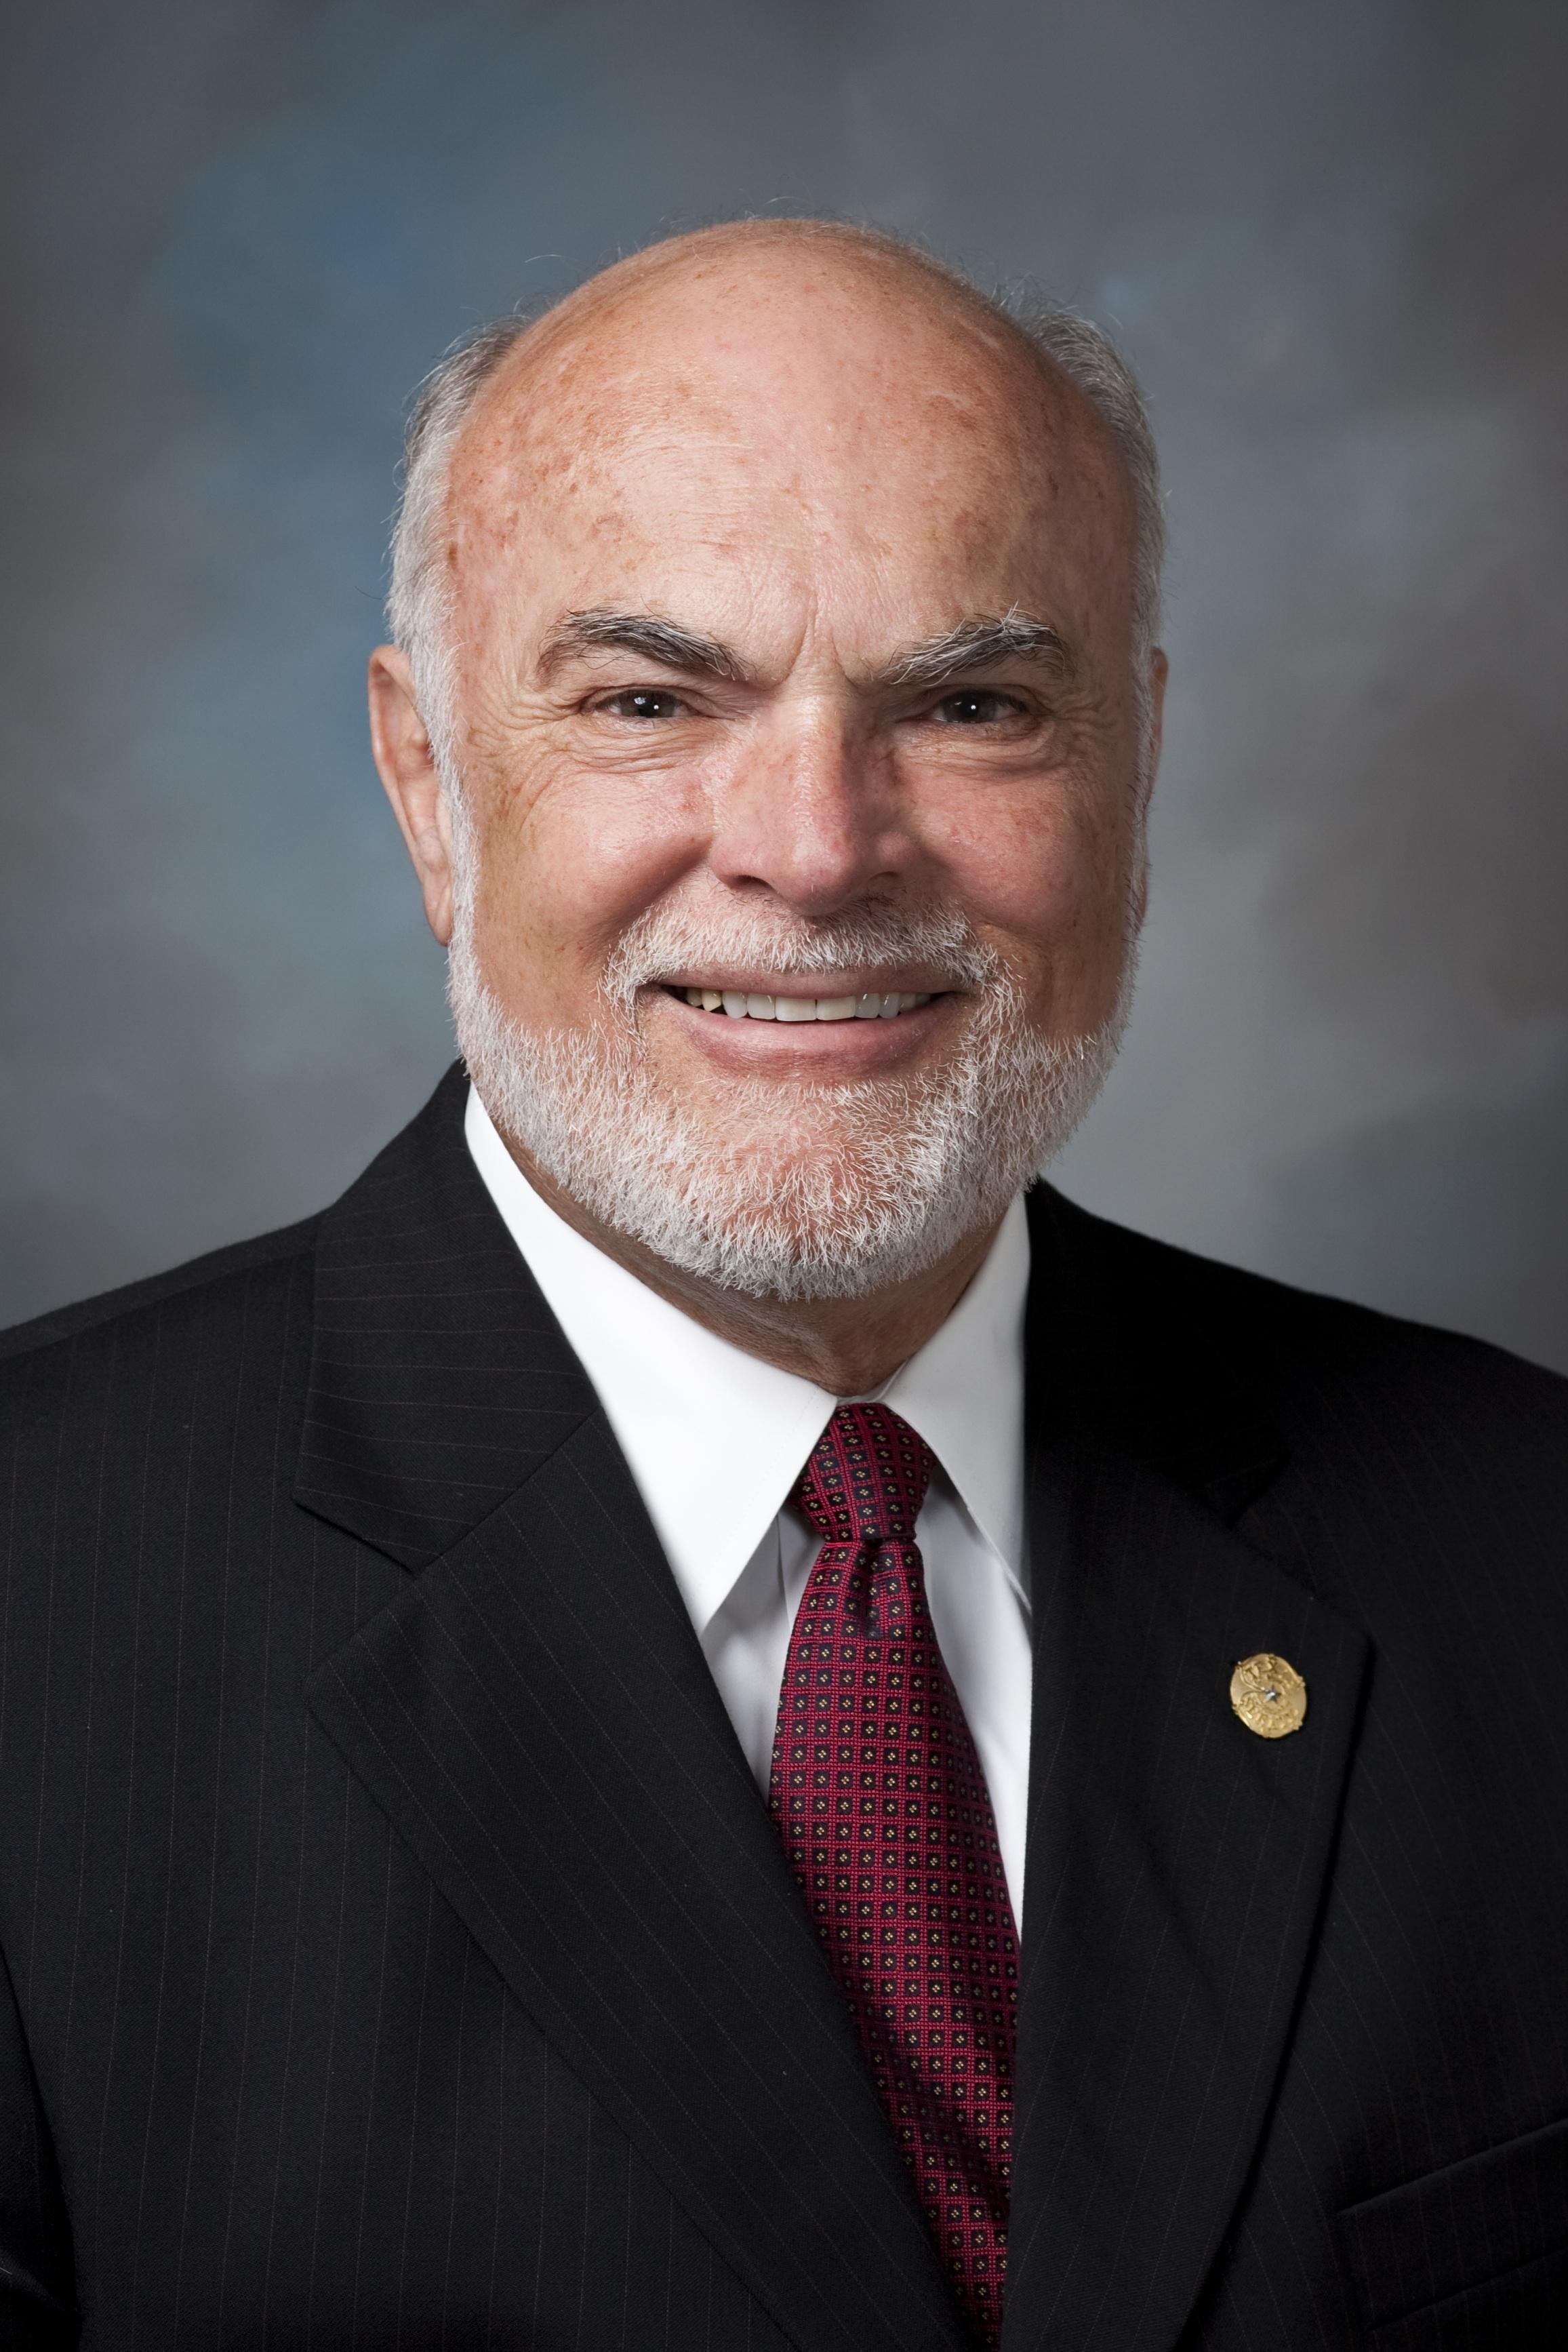 OP-ED: Texas Senate passes bill reforming the ERCOT board